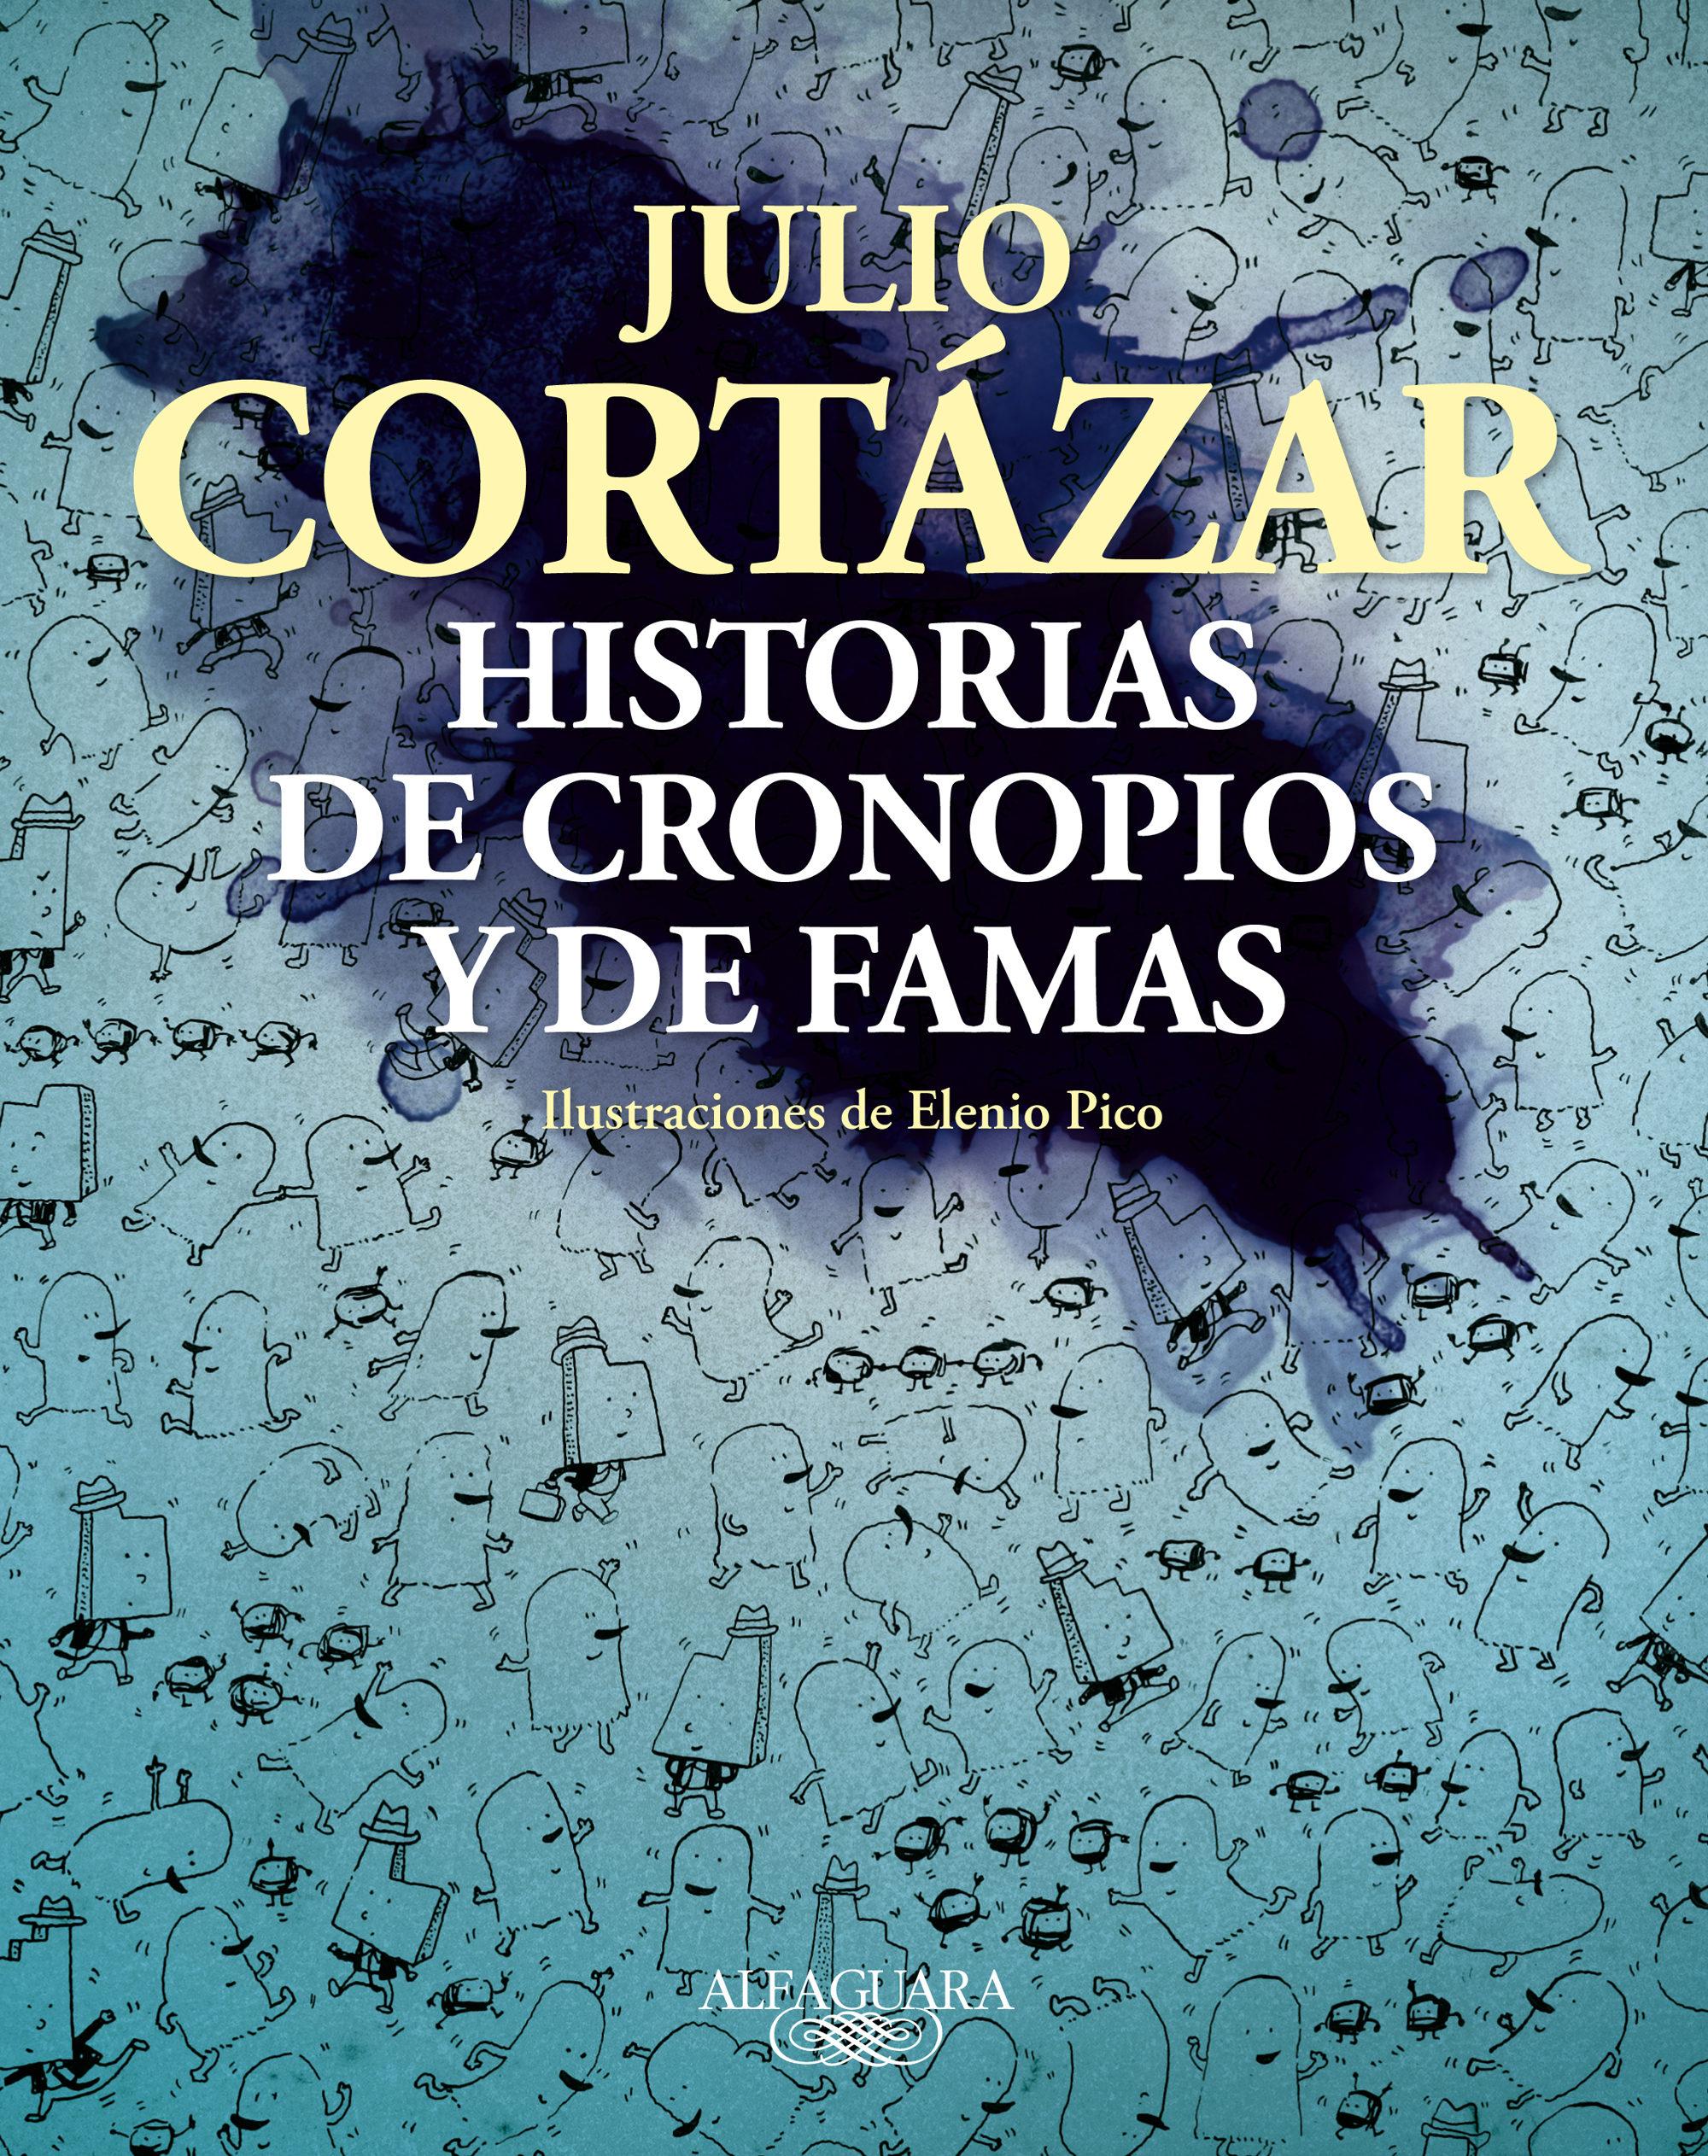 Julio-Cortazar-19